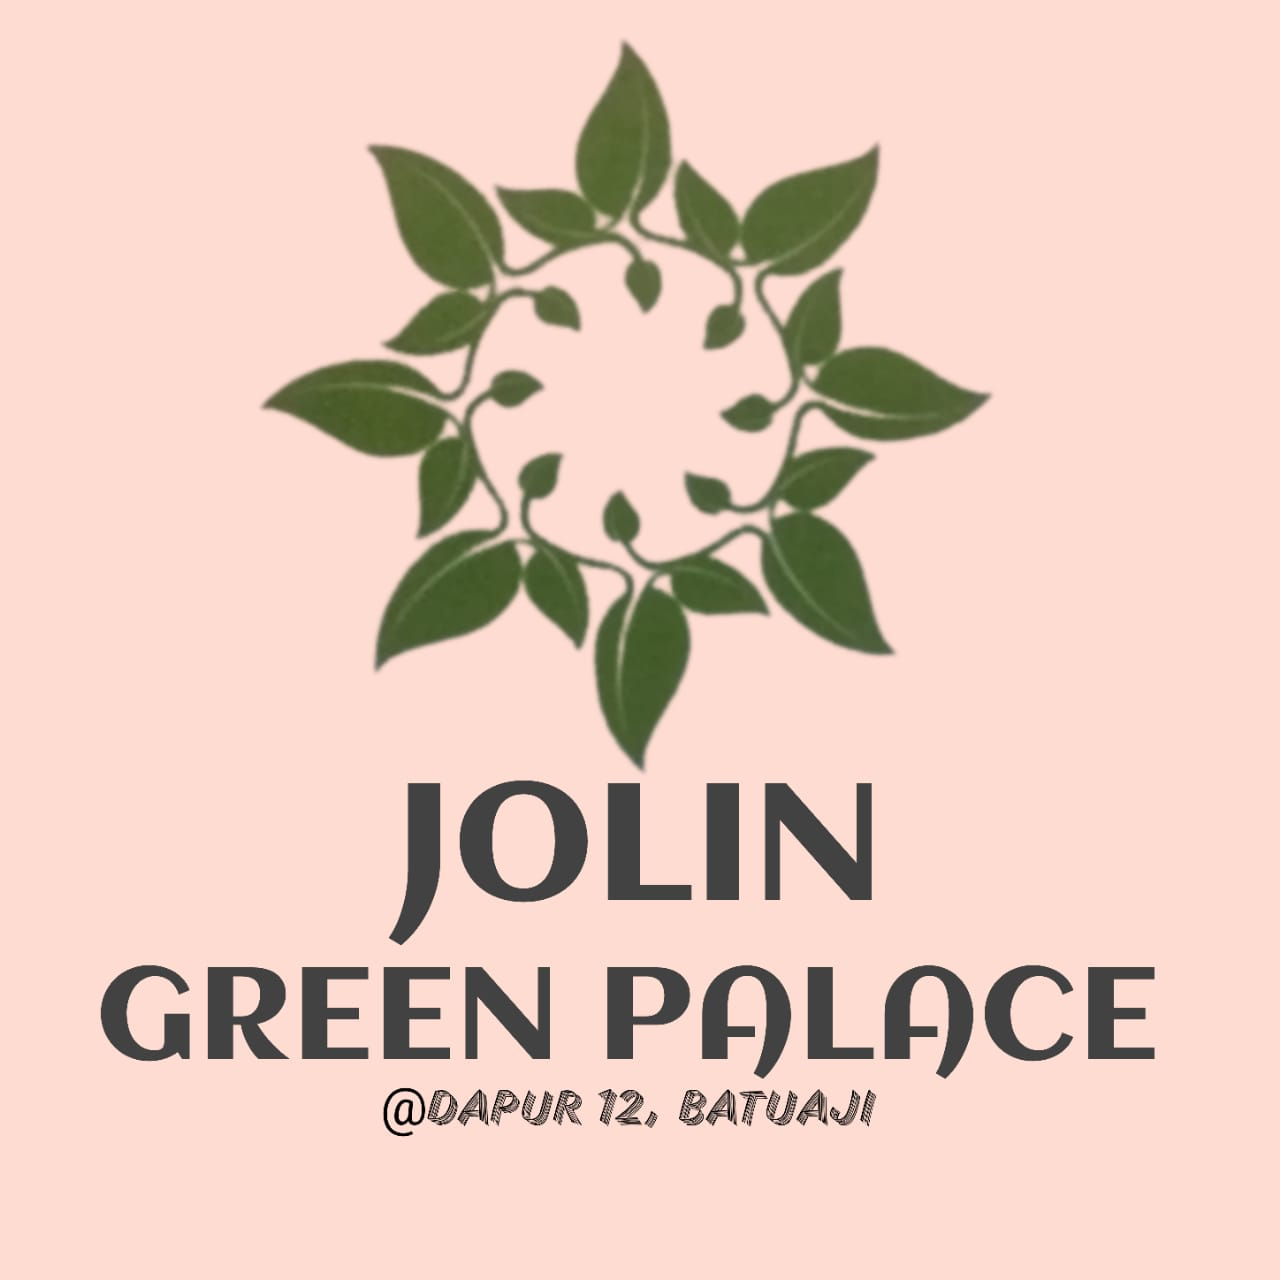 Jolin Green Palace